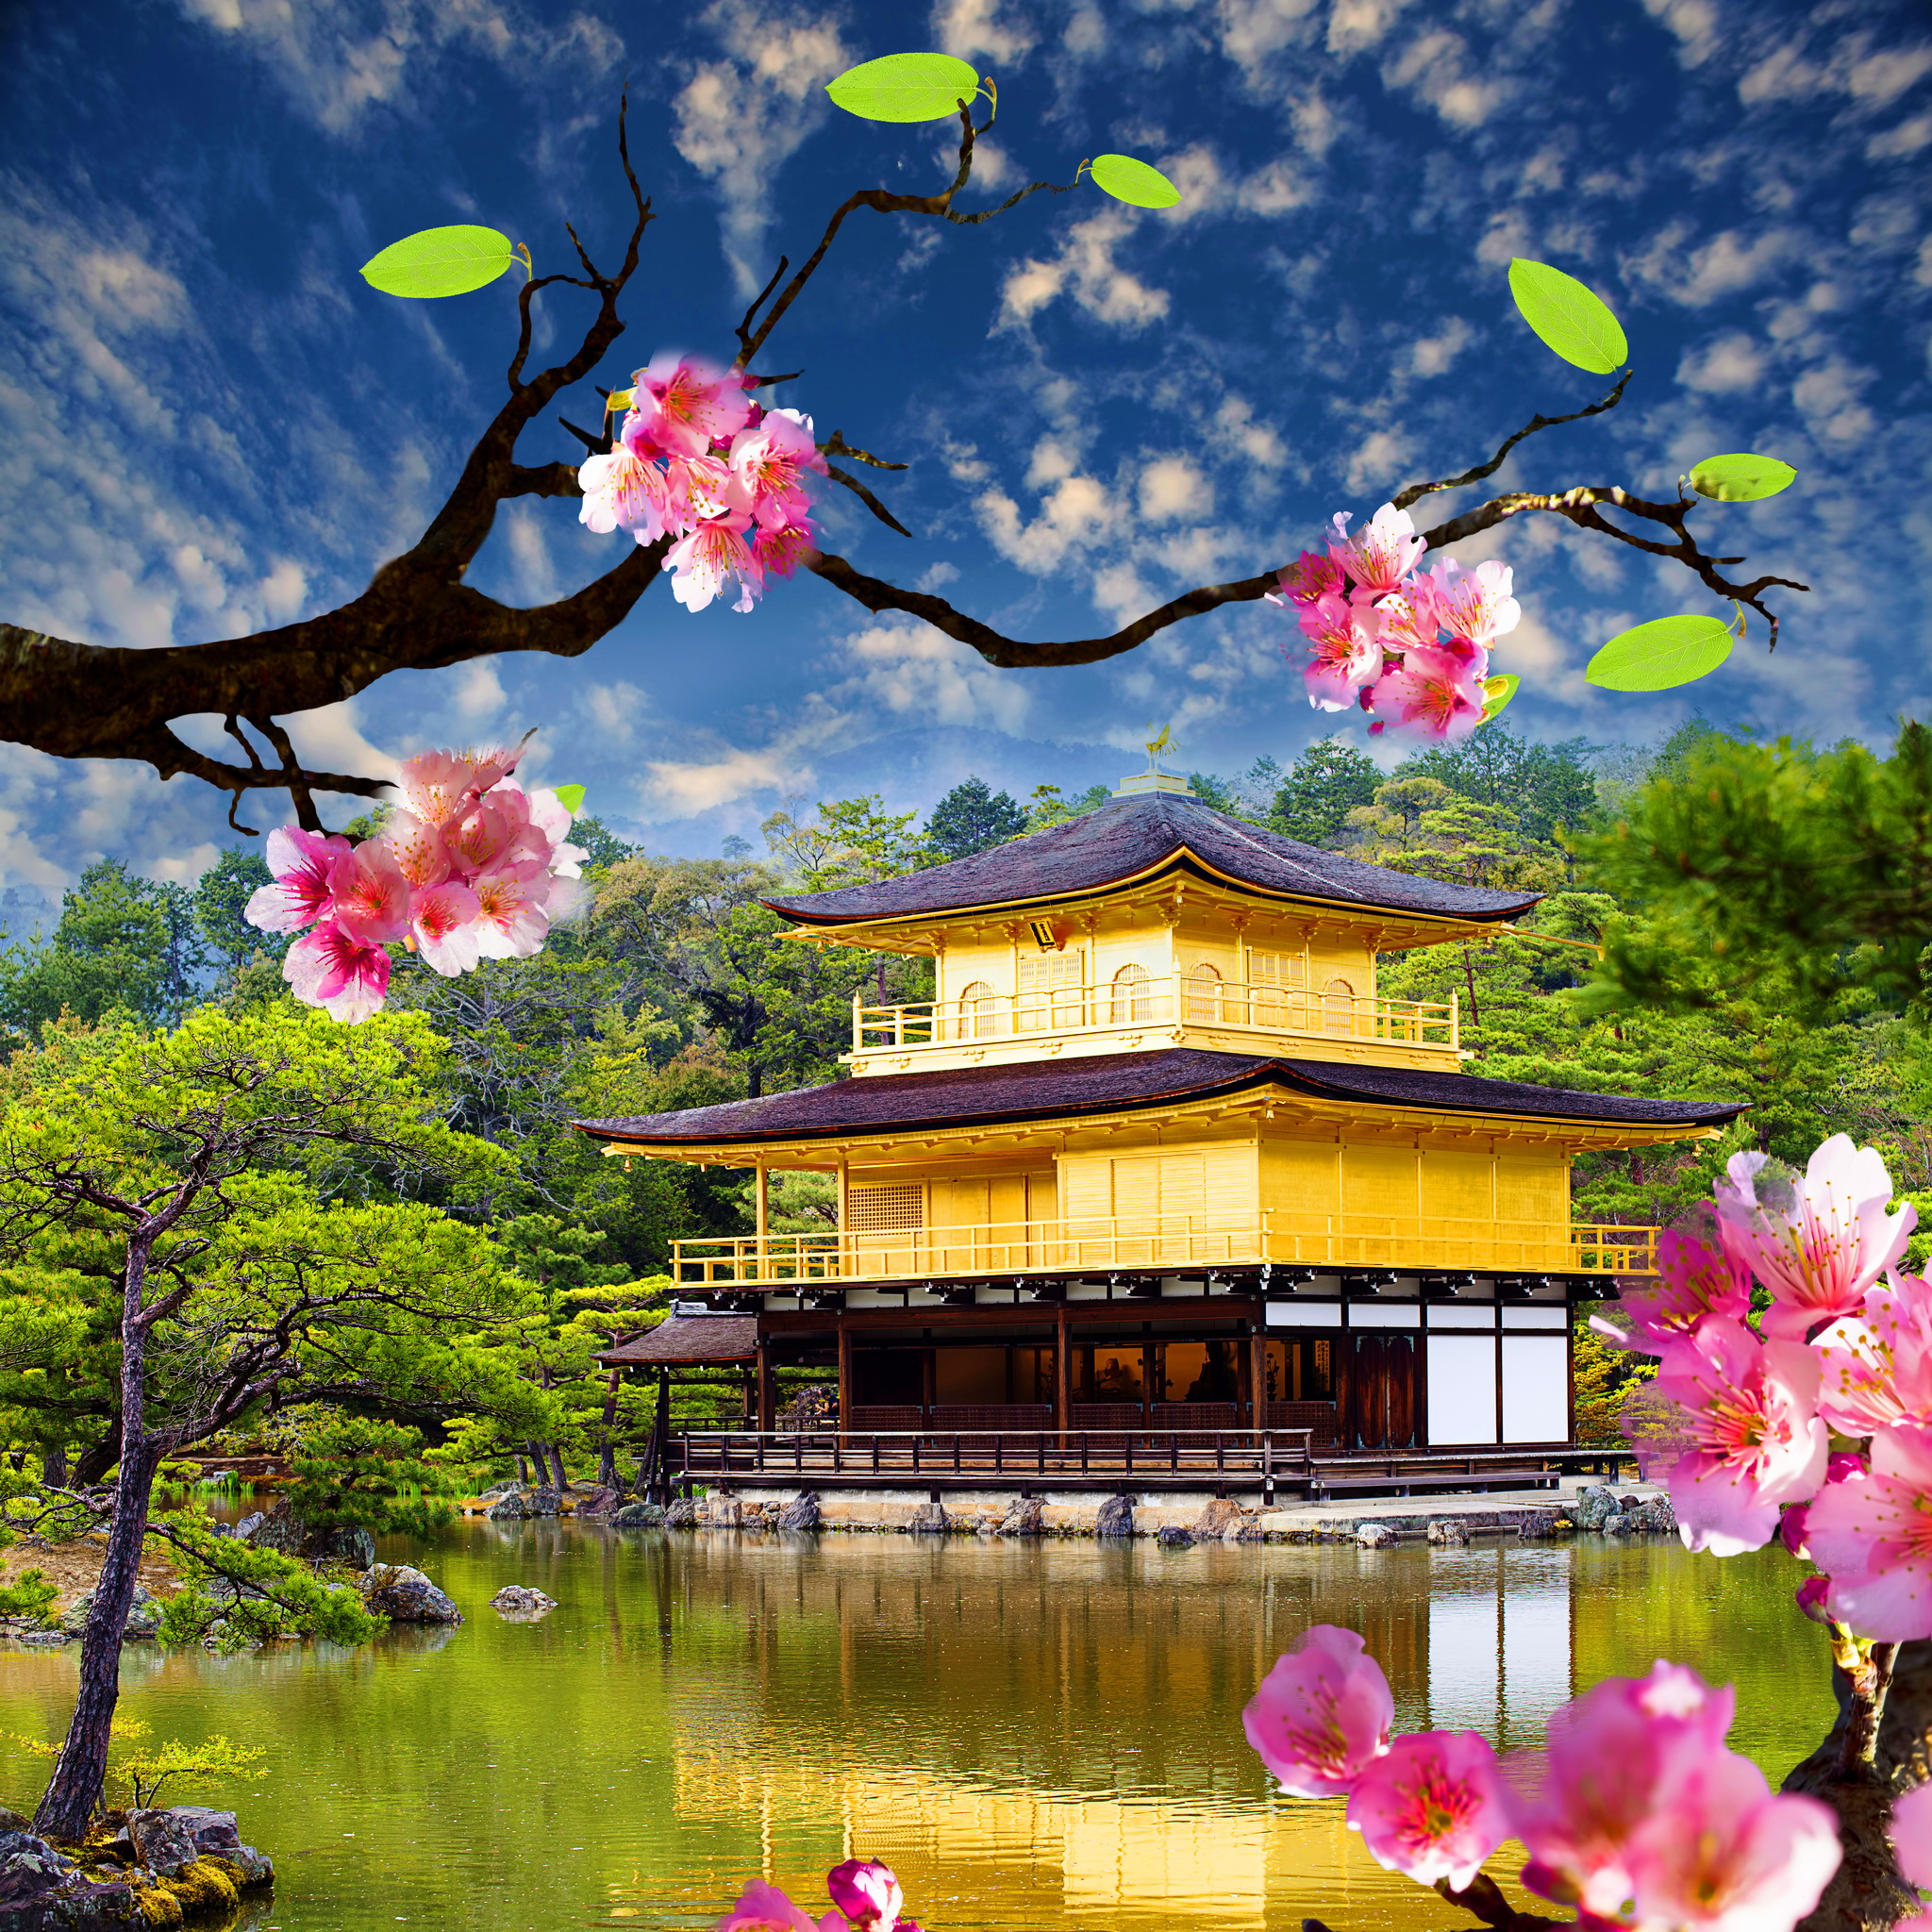 Fond D Ecran Ipad Jardin Japonais 2048x2048 Gratuit